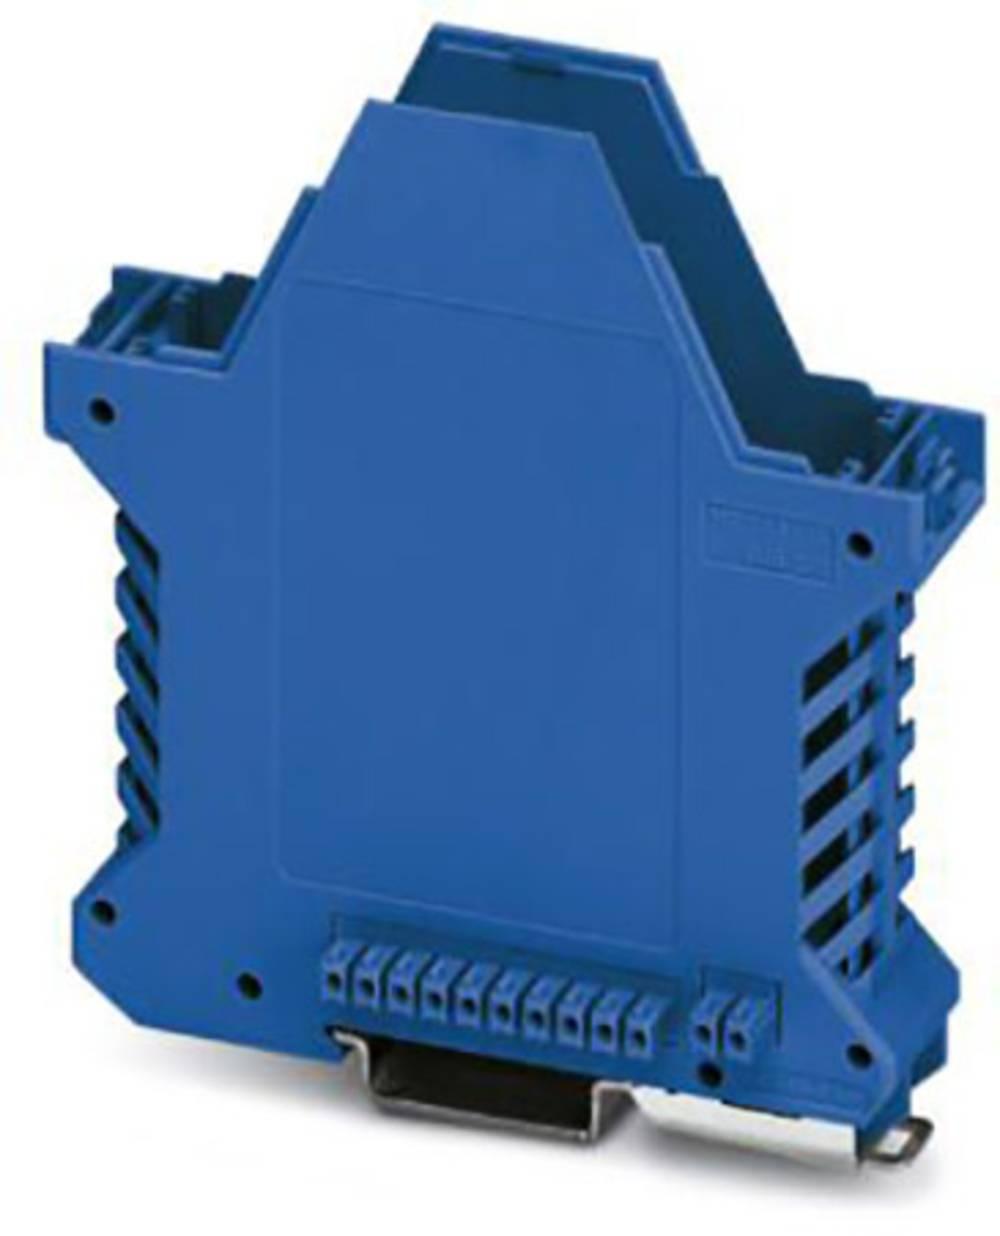 DIN-skinnekabinet underdel Phoenix Contact ME 22,5 UT/FE BUS/10+2 BU Polyamid 10 stk